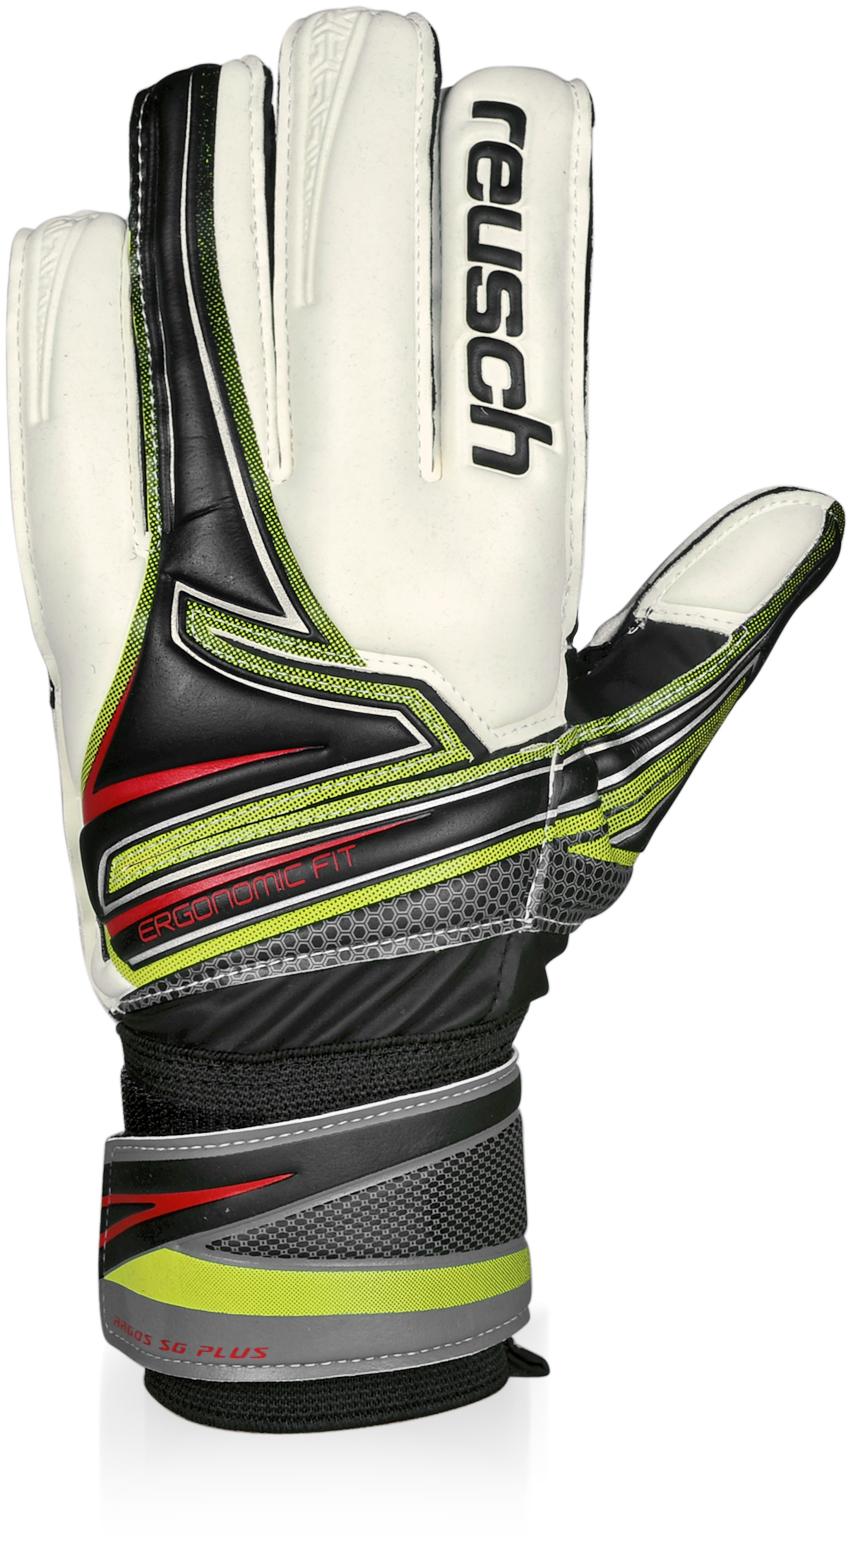 Reusch Argos Sg Plus Goalkeeper Gloves (black)